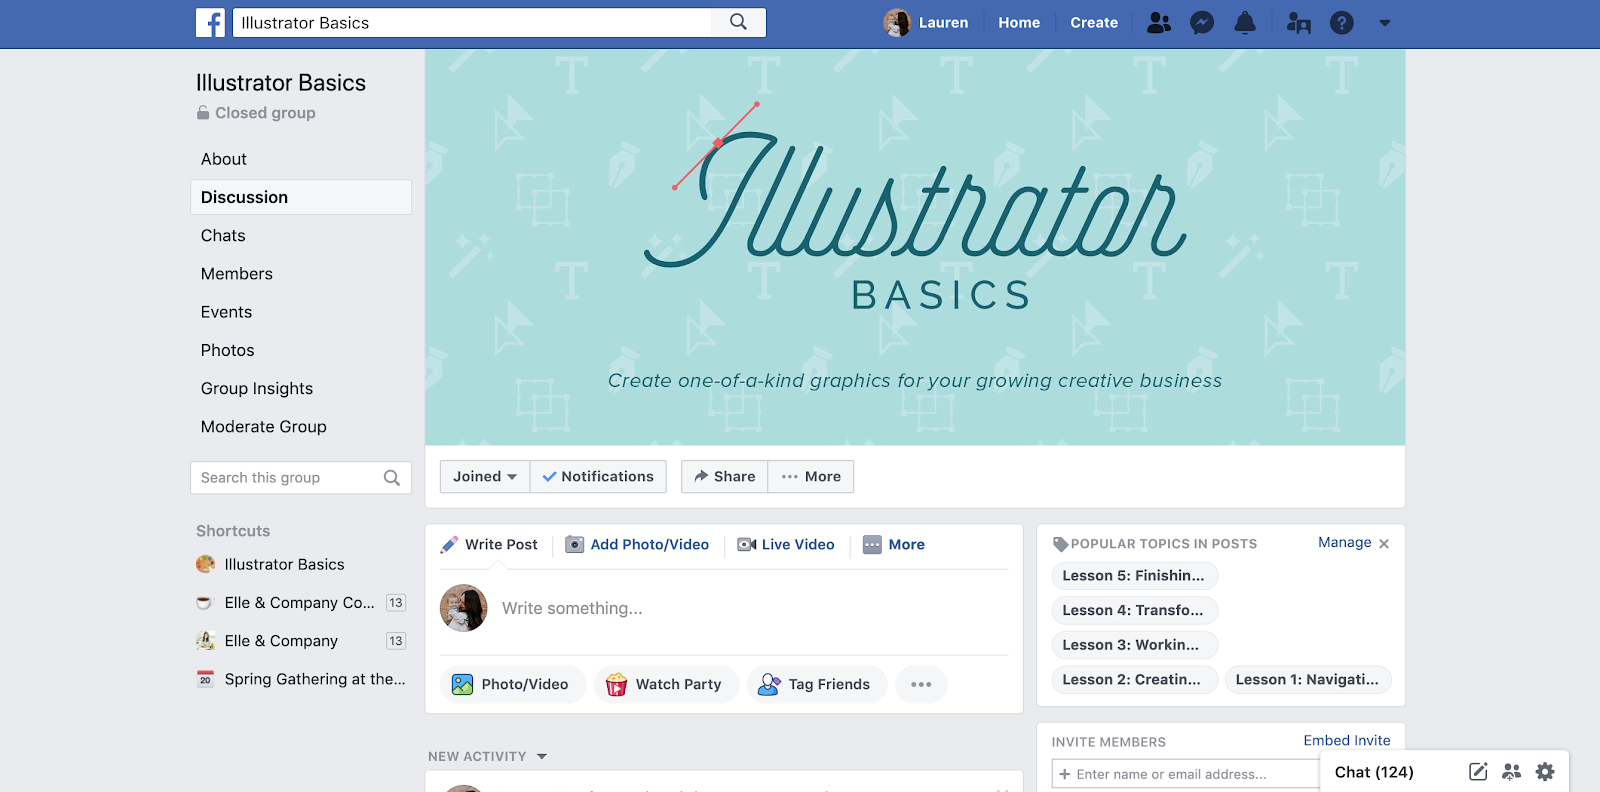 How I'm Preparing for the Illustrator Basics Course Launch - Elle & Company